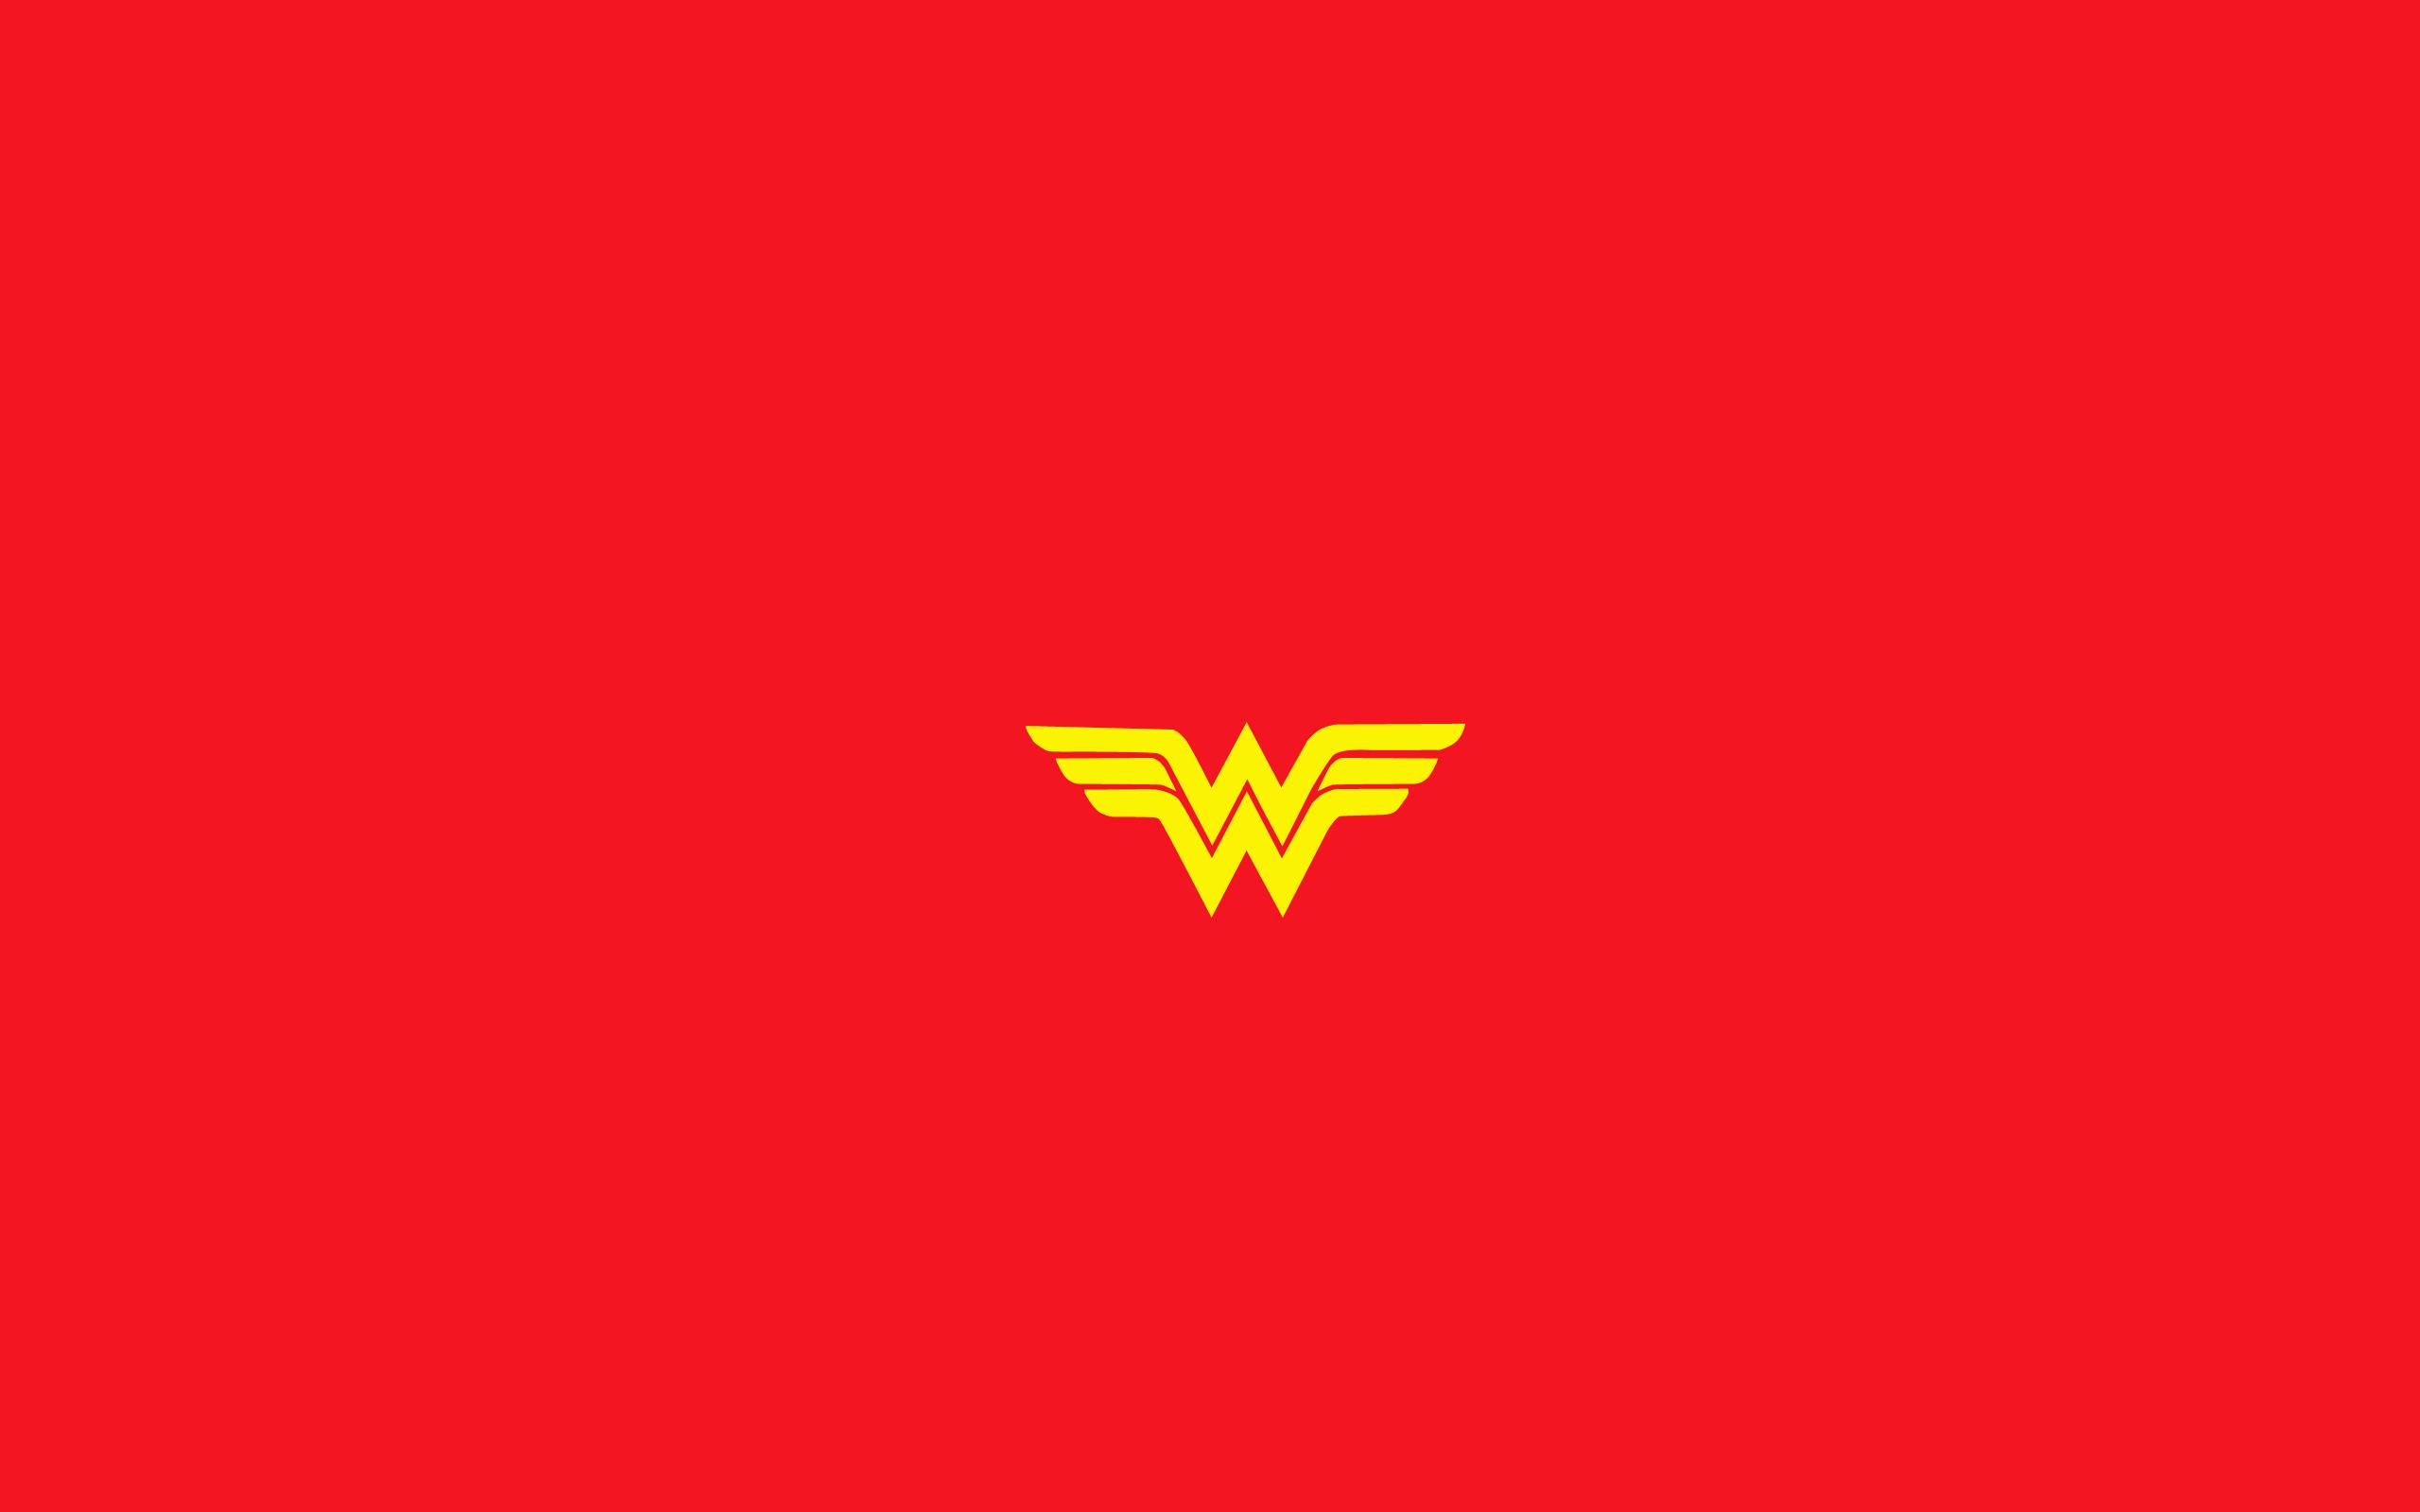 Wonder Woman Logo Wallpaper 61 Images: 2048x1152 Wonder Woman Logo 2048x1152 Resolution HD 4k